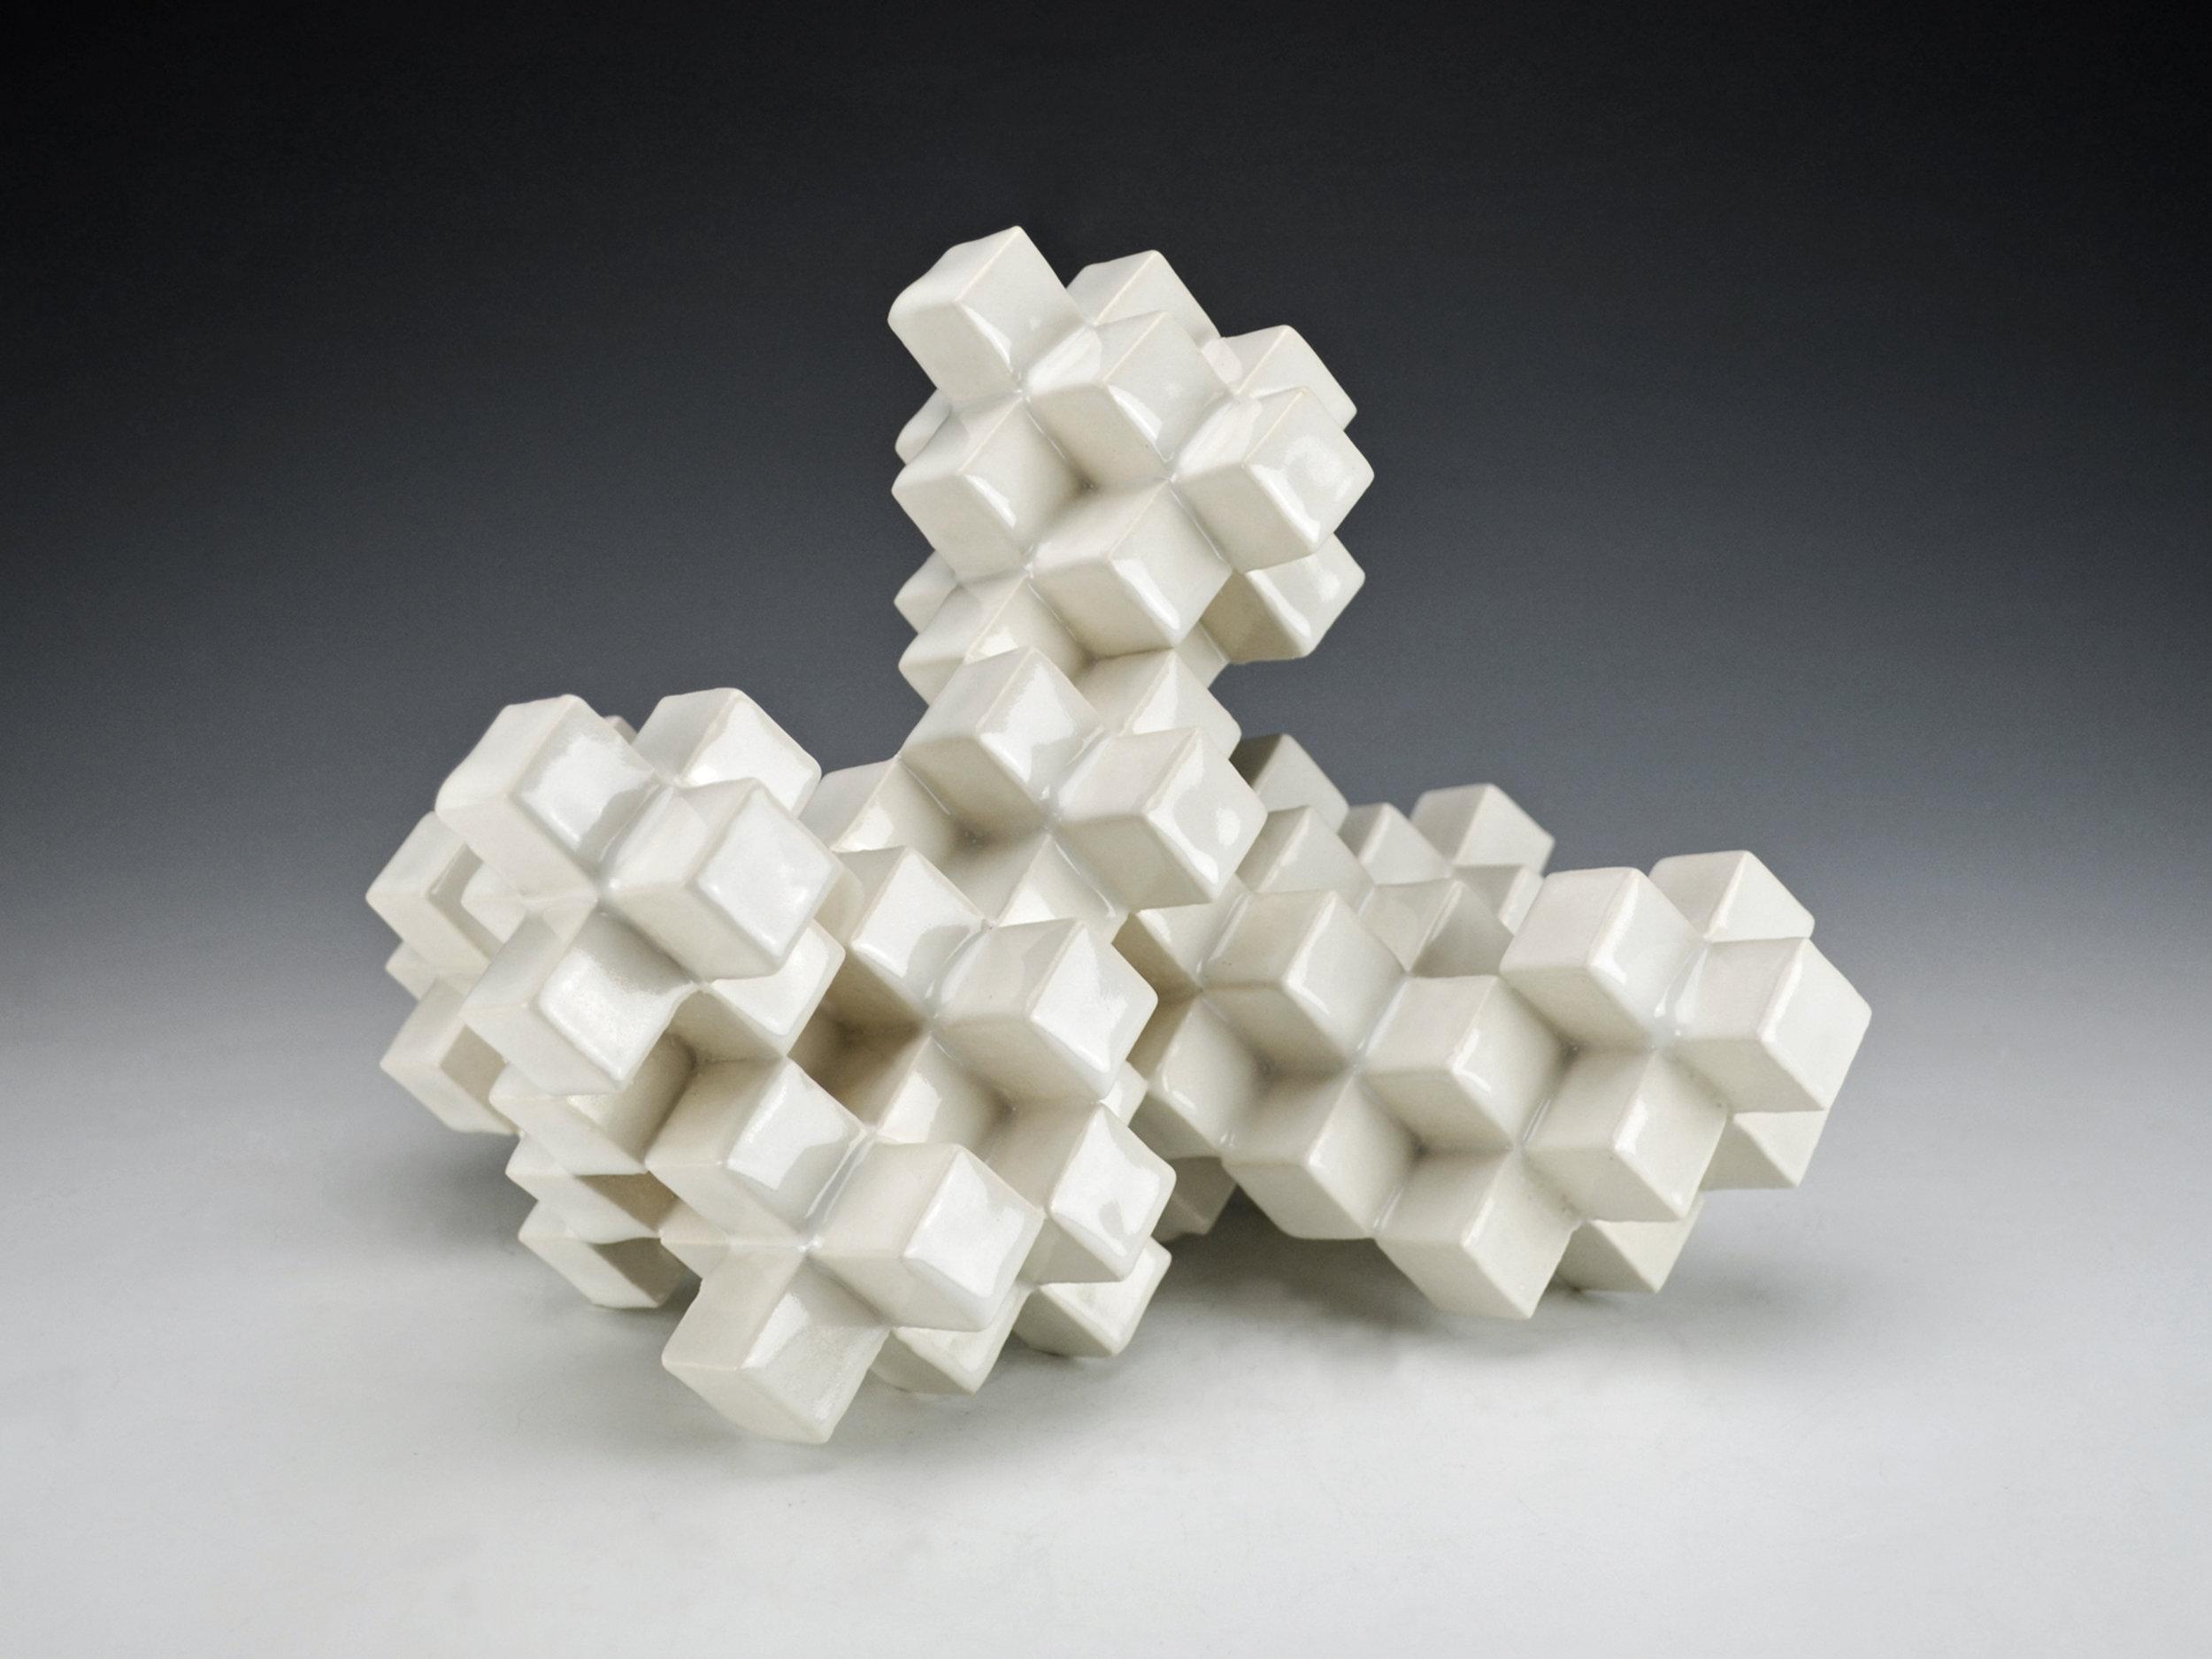 Cubic Series: Construction V  |  9 x 9 x 8 inches  |  Porcelain, Glaze  |  2017